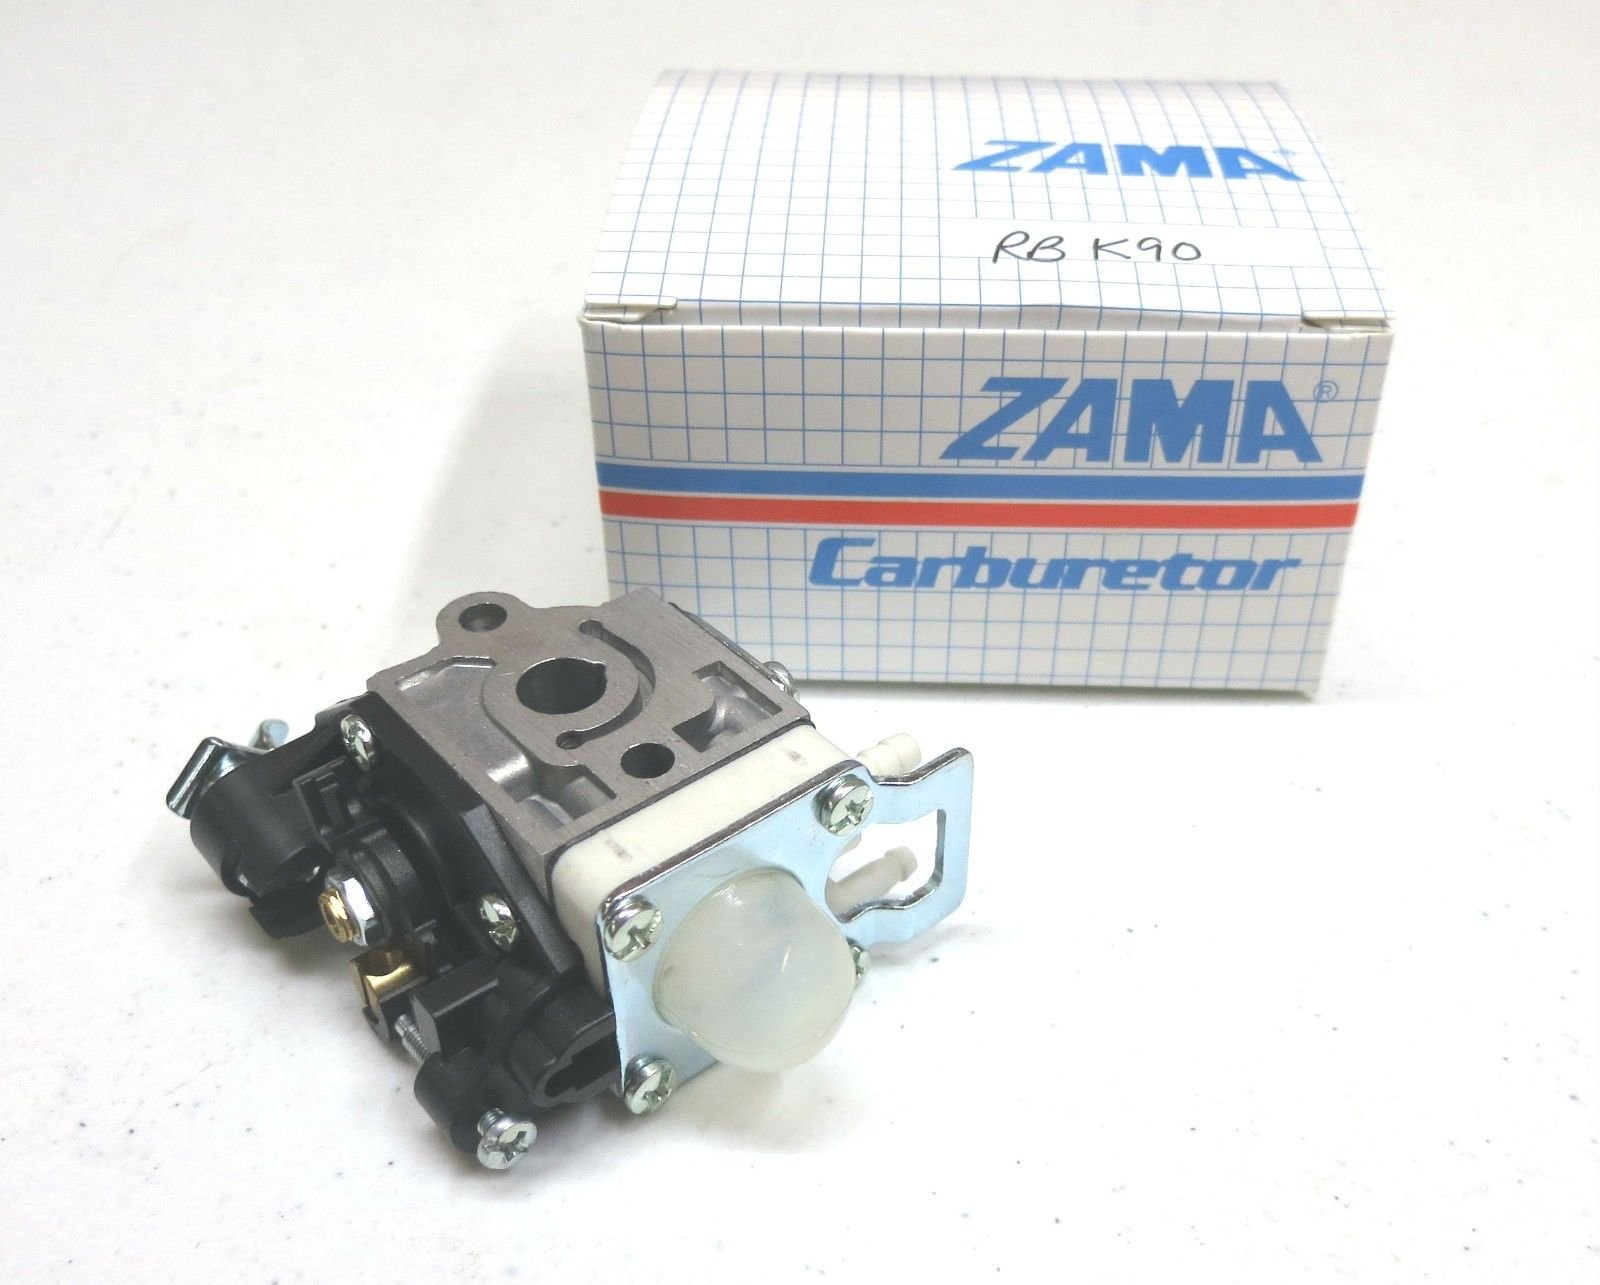 OEM Zama RB-K90 CARBURETOR Carb for Echo PB-255 PB-255LN Handheld Power Blowers supplier_id_theropshop, #UGEIO39251494708136